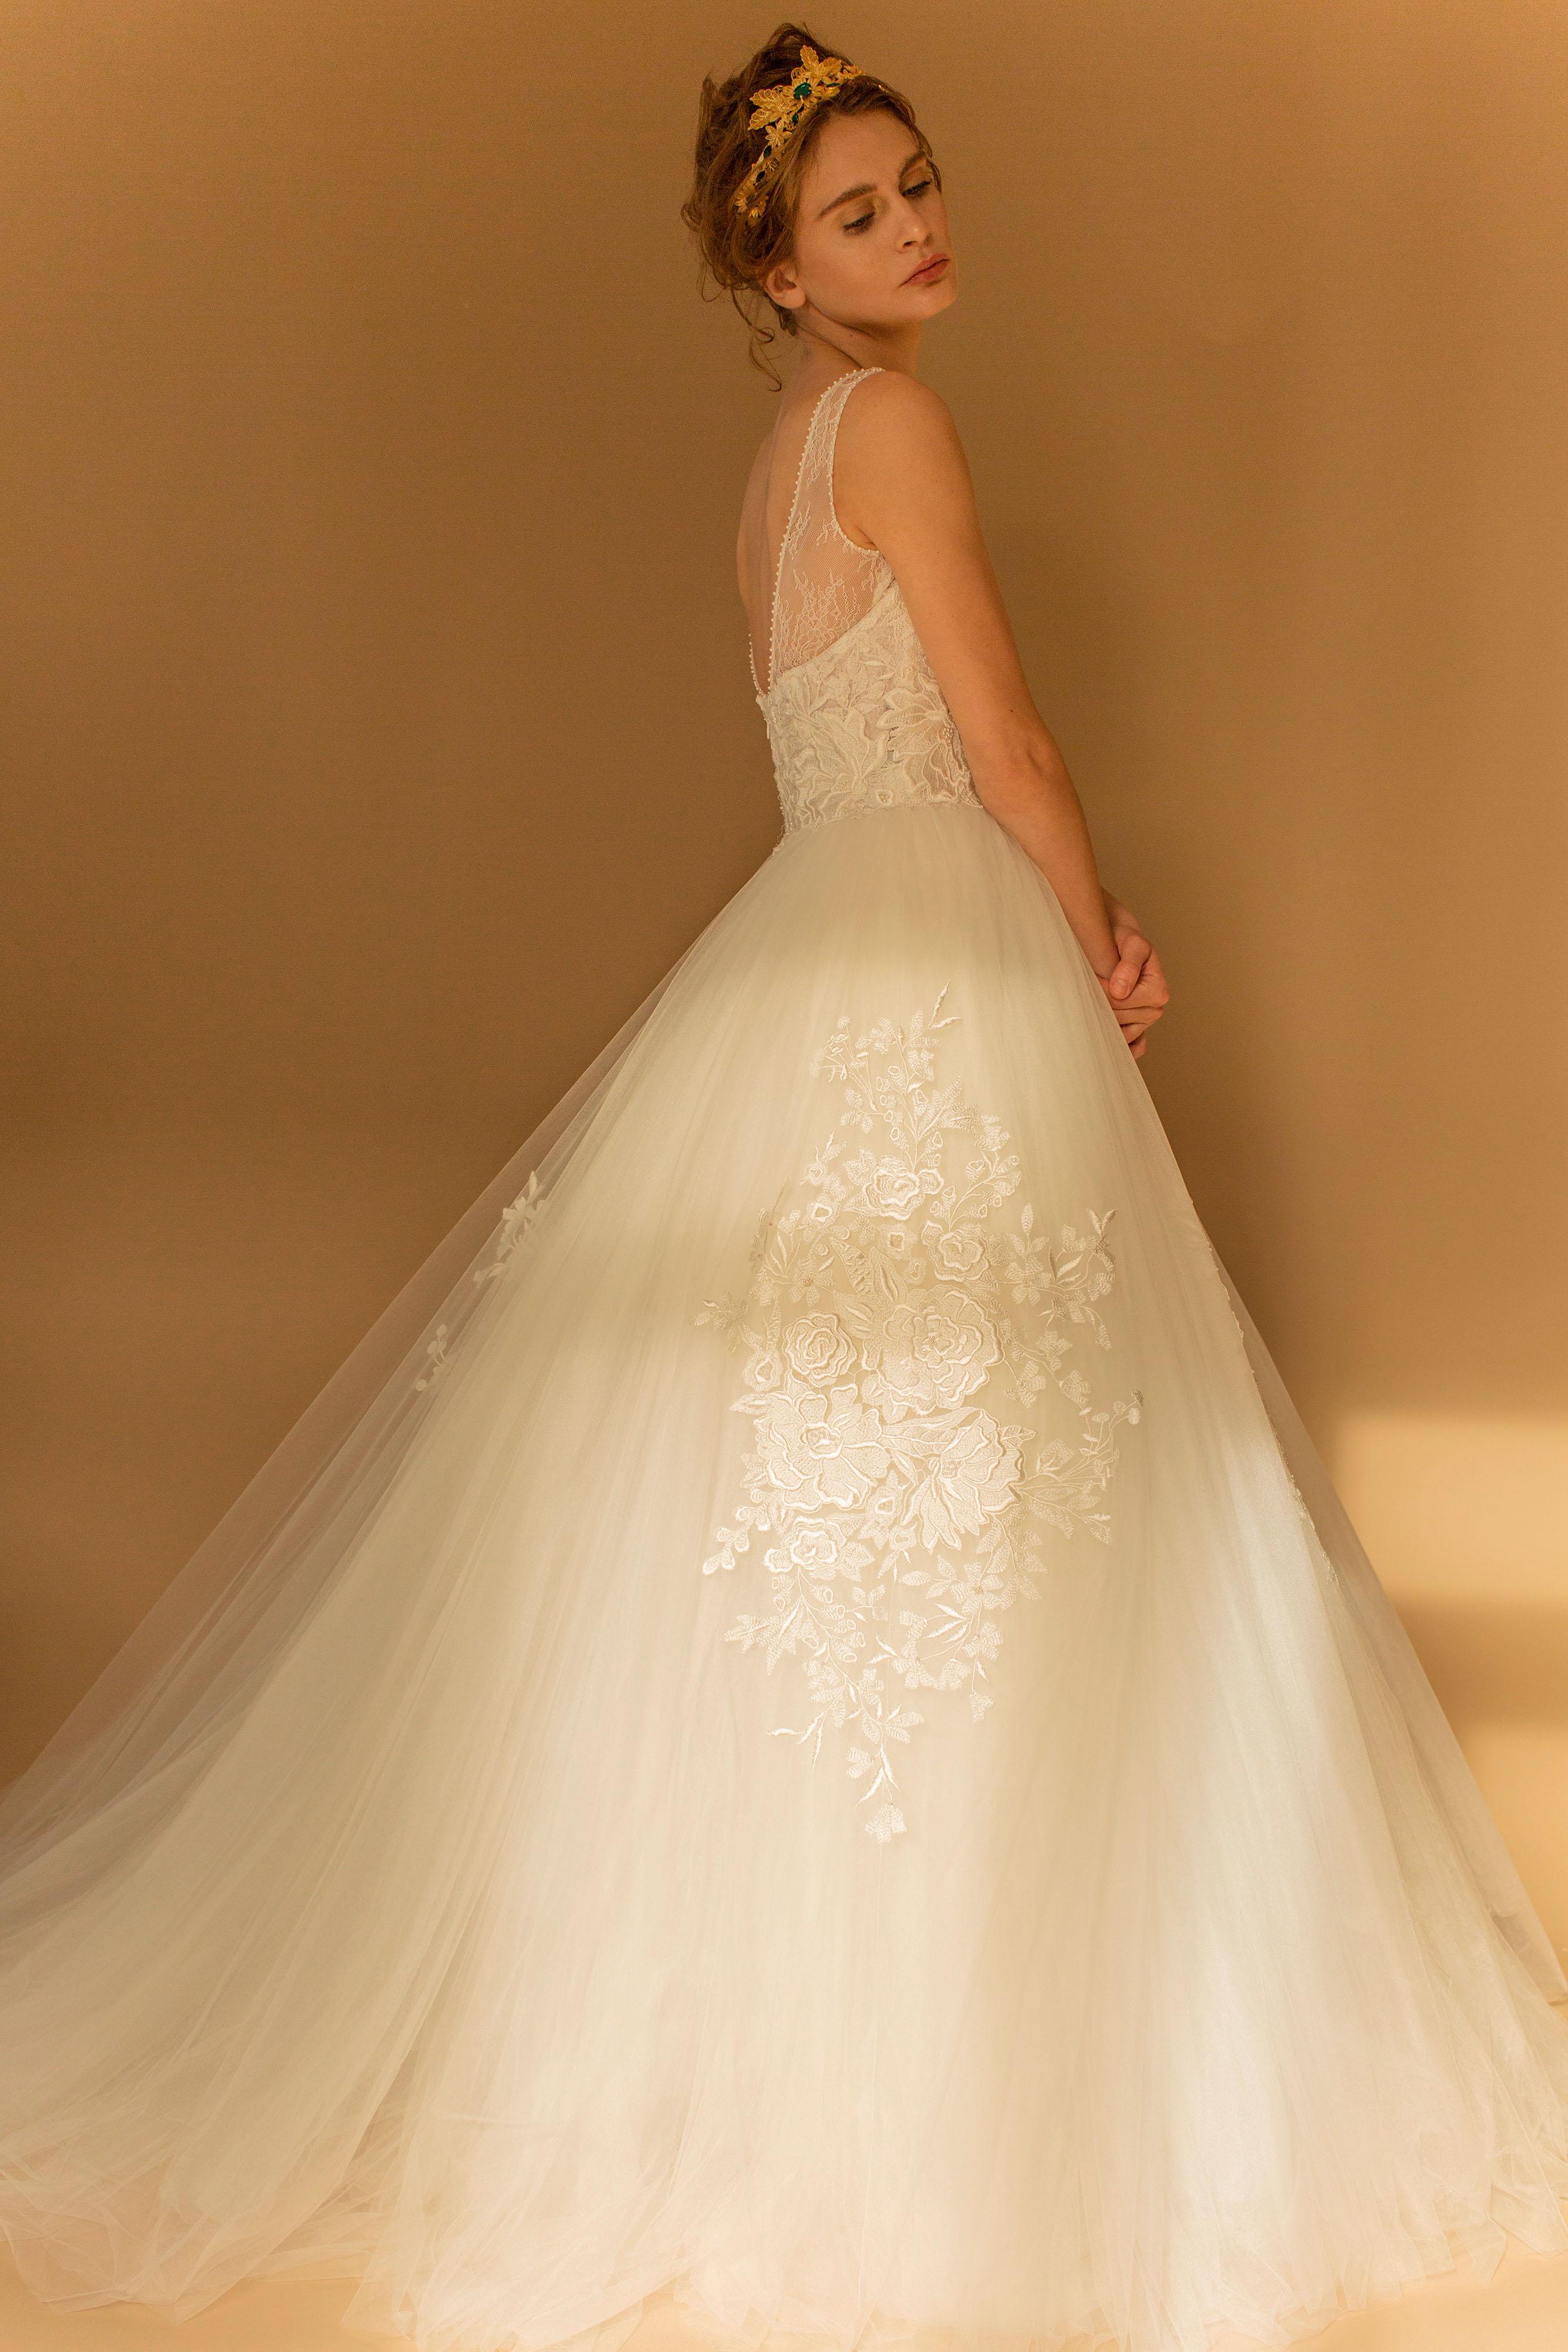 francesca miranda wedding dress fall 2018 lace sleeveless ball gown